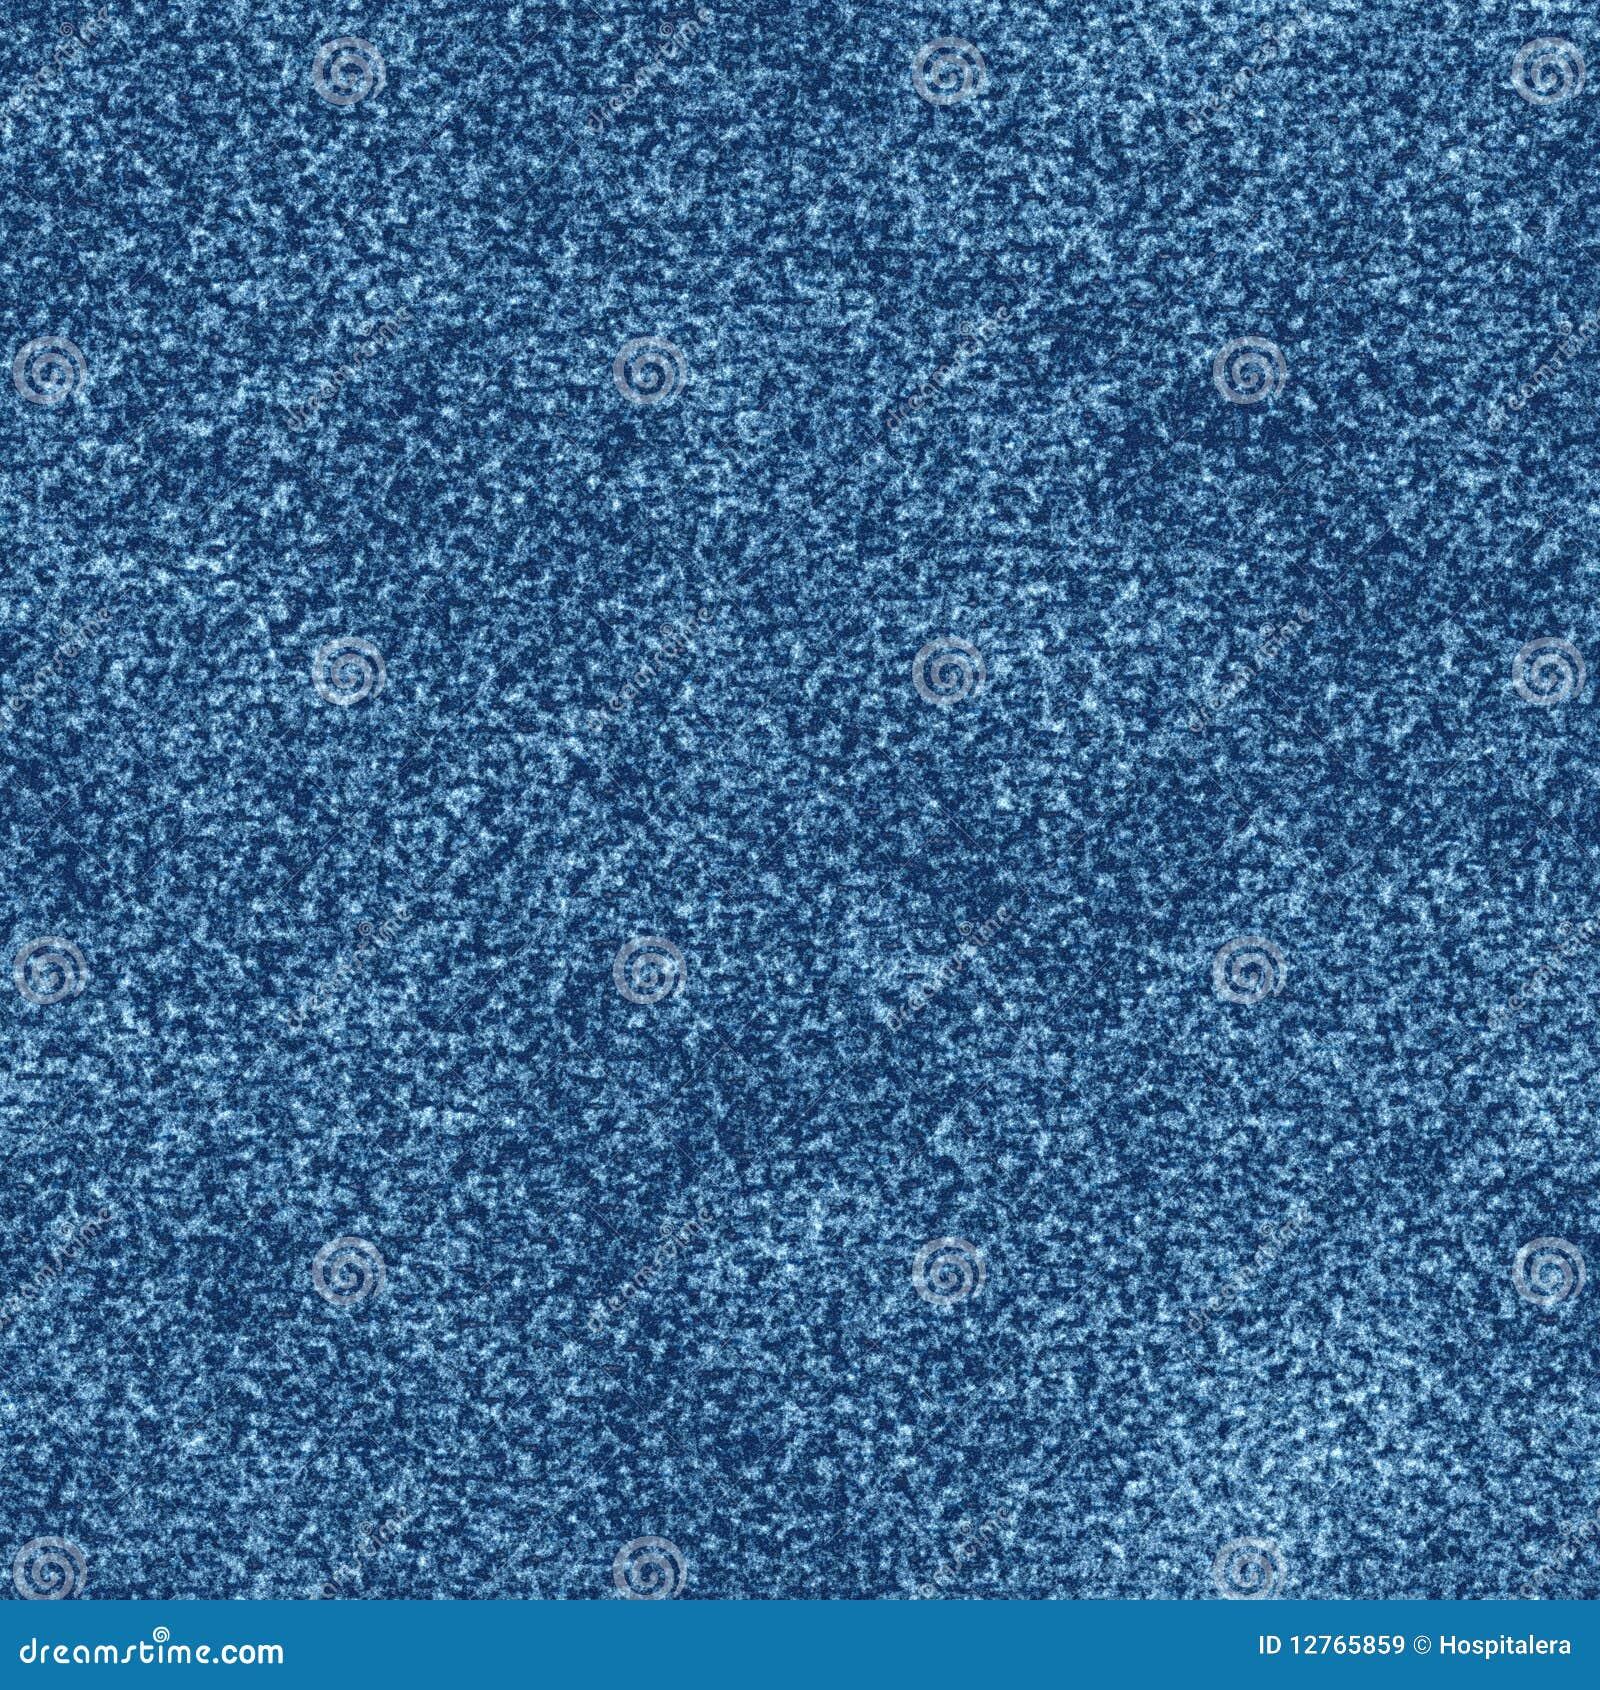 blauer teppich free sisaloptik sisaloptik with blauer. Black Bedroom Furniture Sets. Home Design Ideas